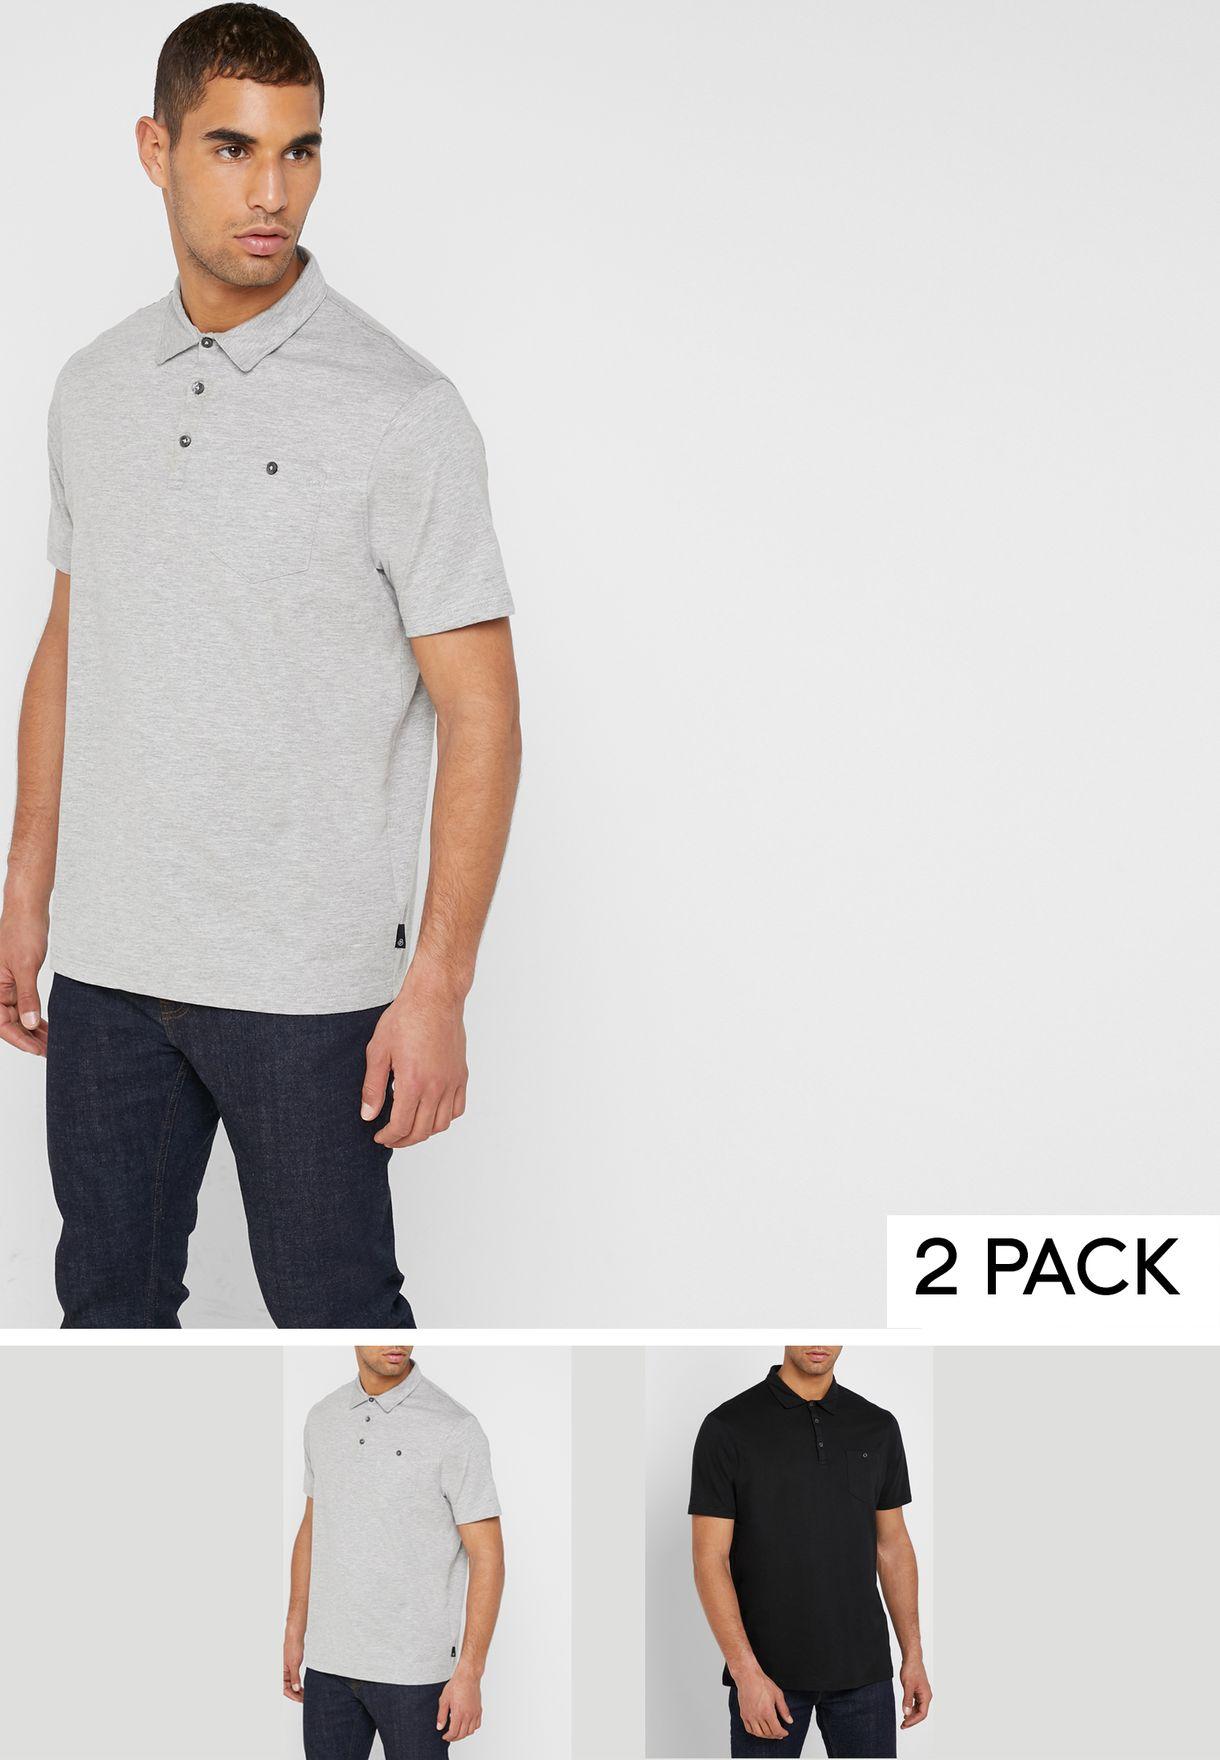 2 Packs Essential Polo